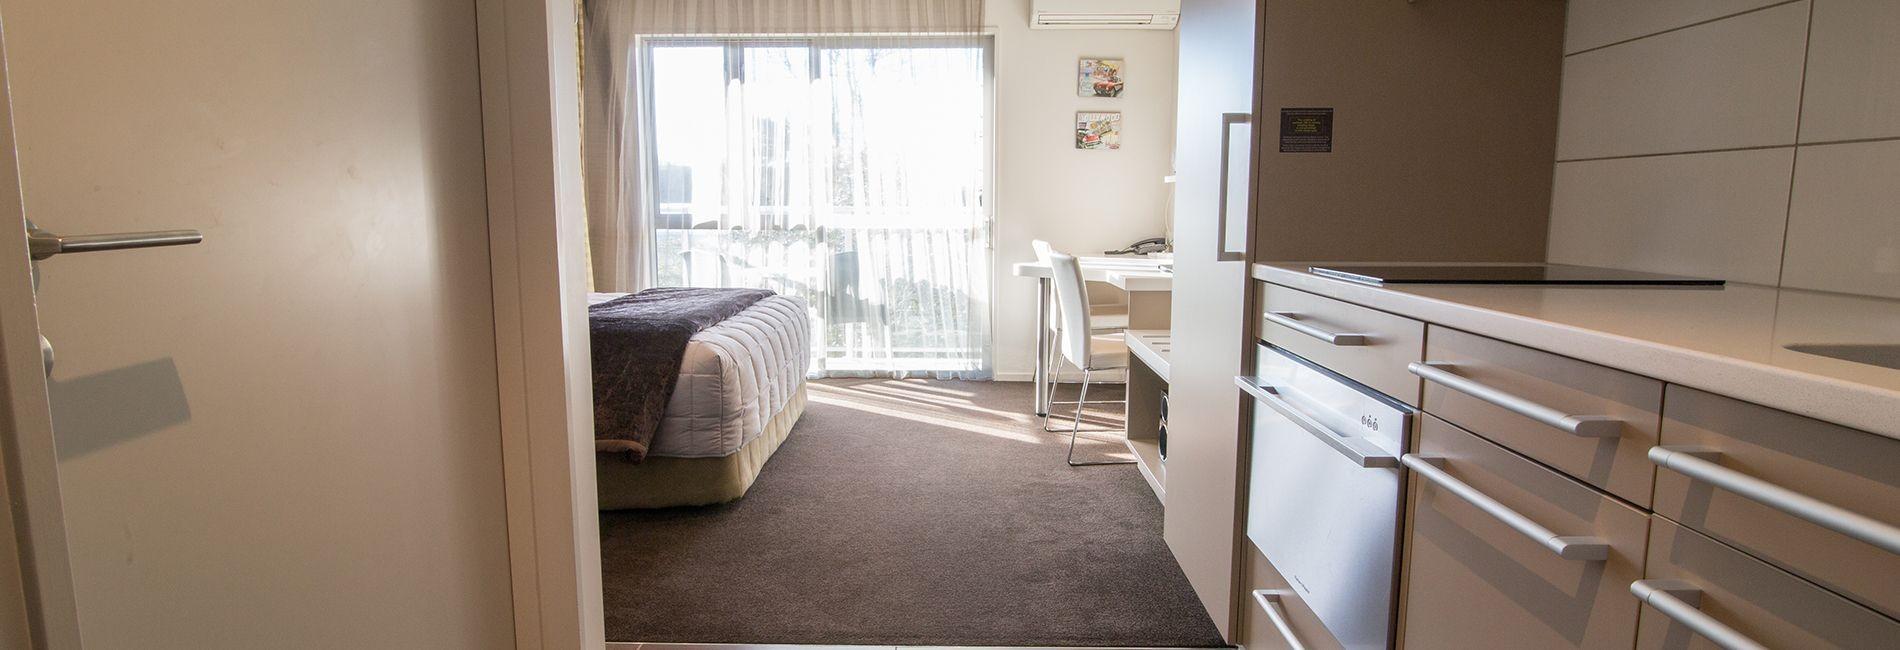 standard studio accommodation